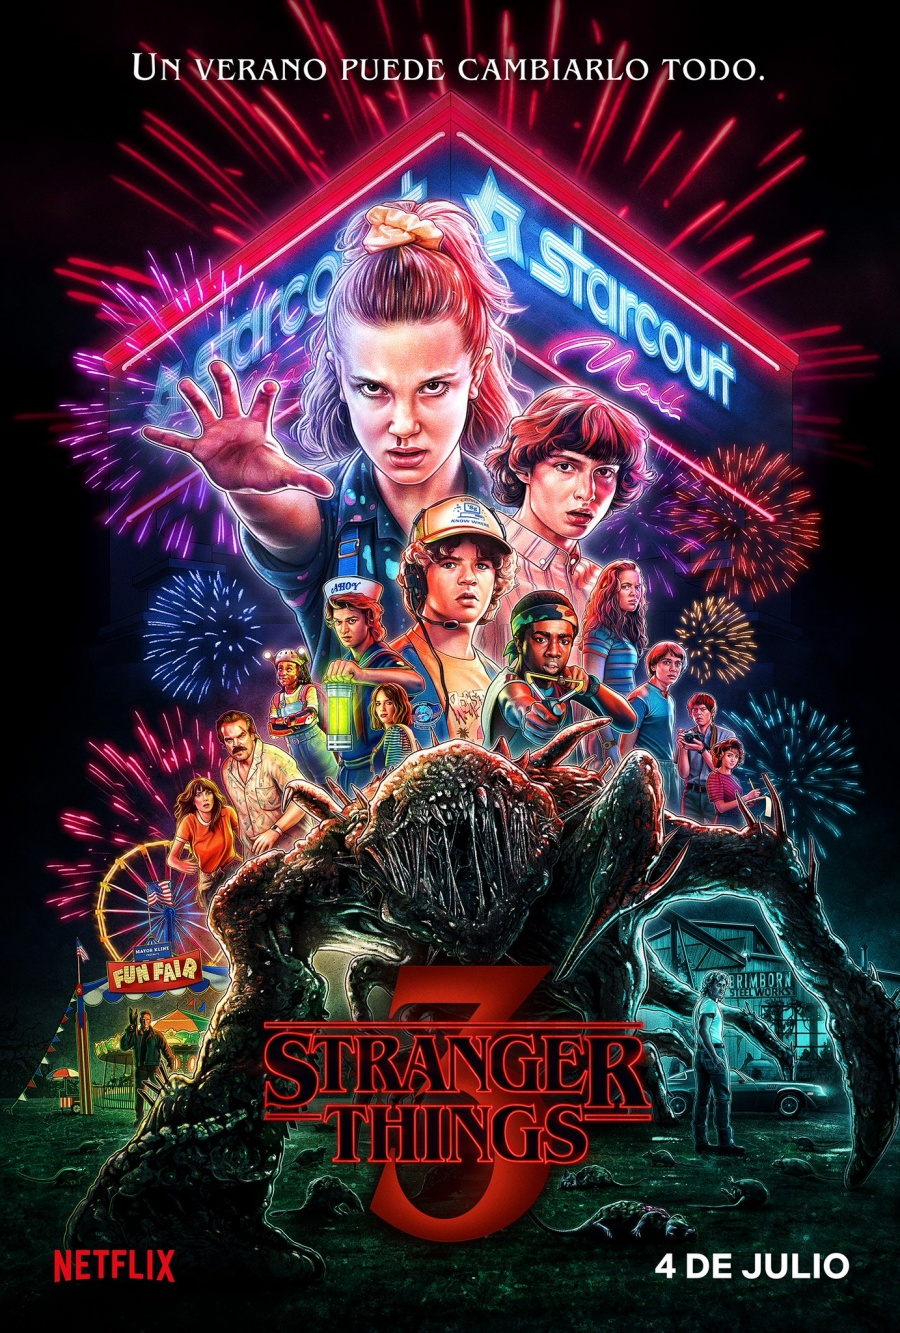 Lanzan primer póster de la tercera temporada de Stranger Things